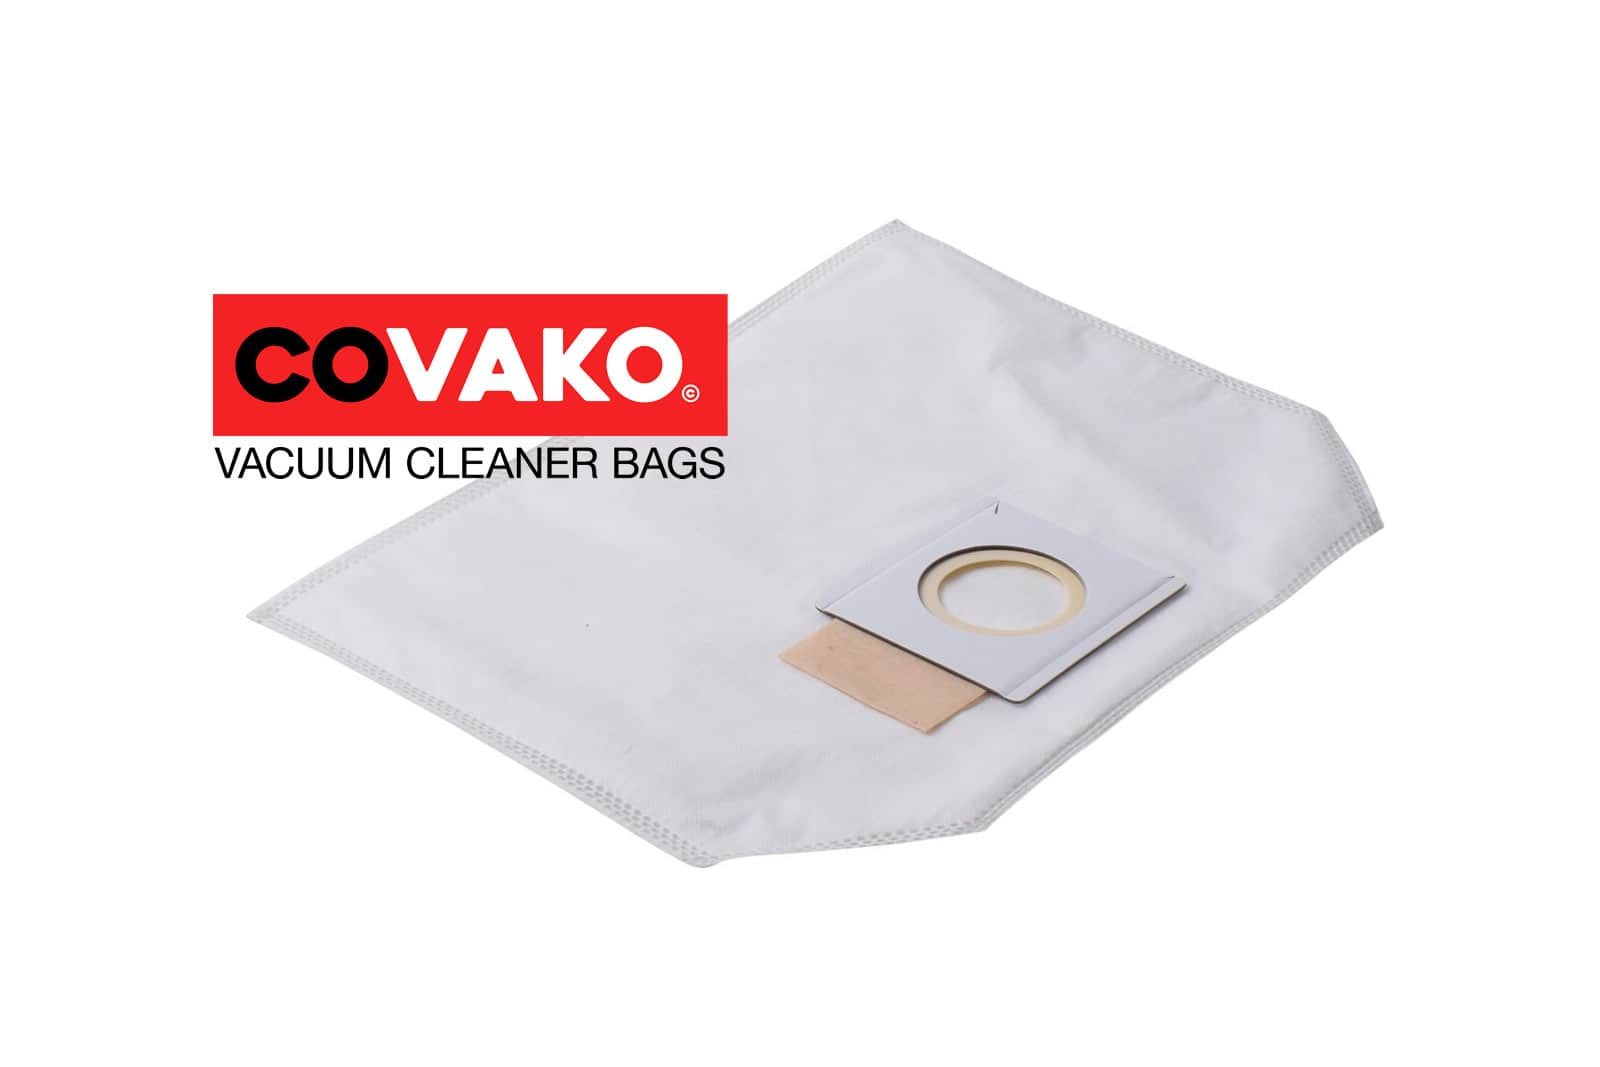 Makita DVC 260 Z / Synthétique - Makita sacs d'aspirateur